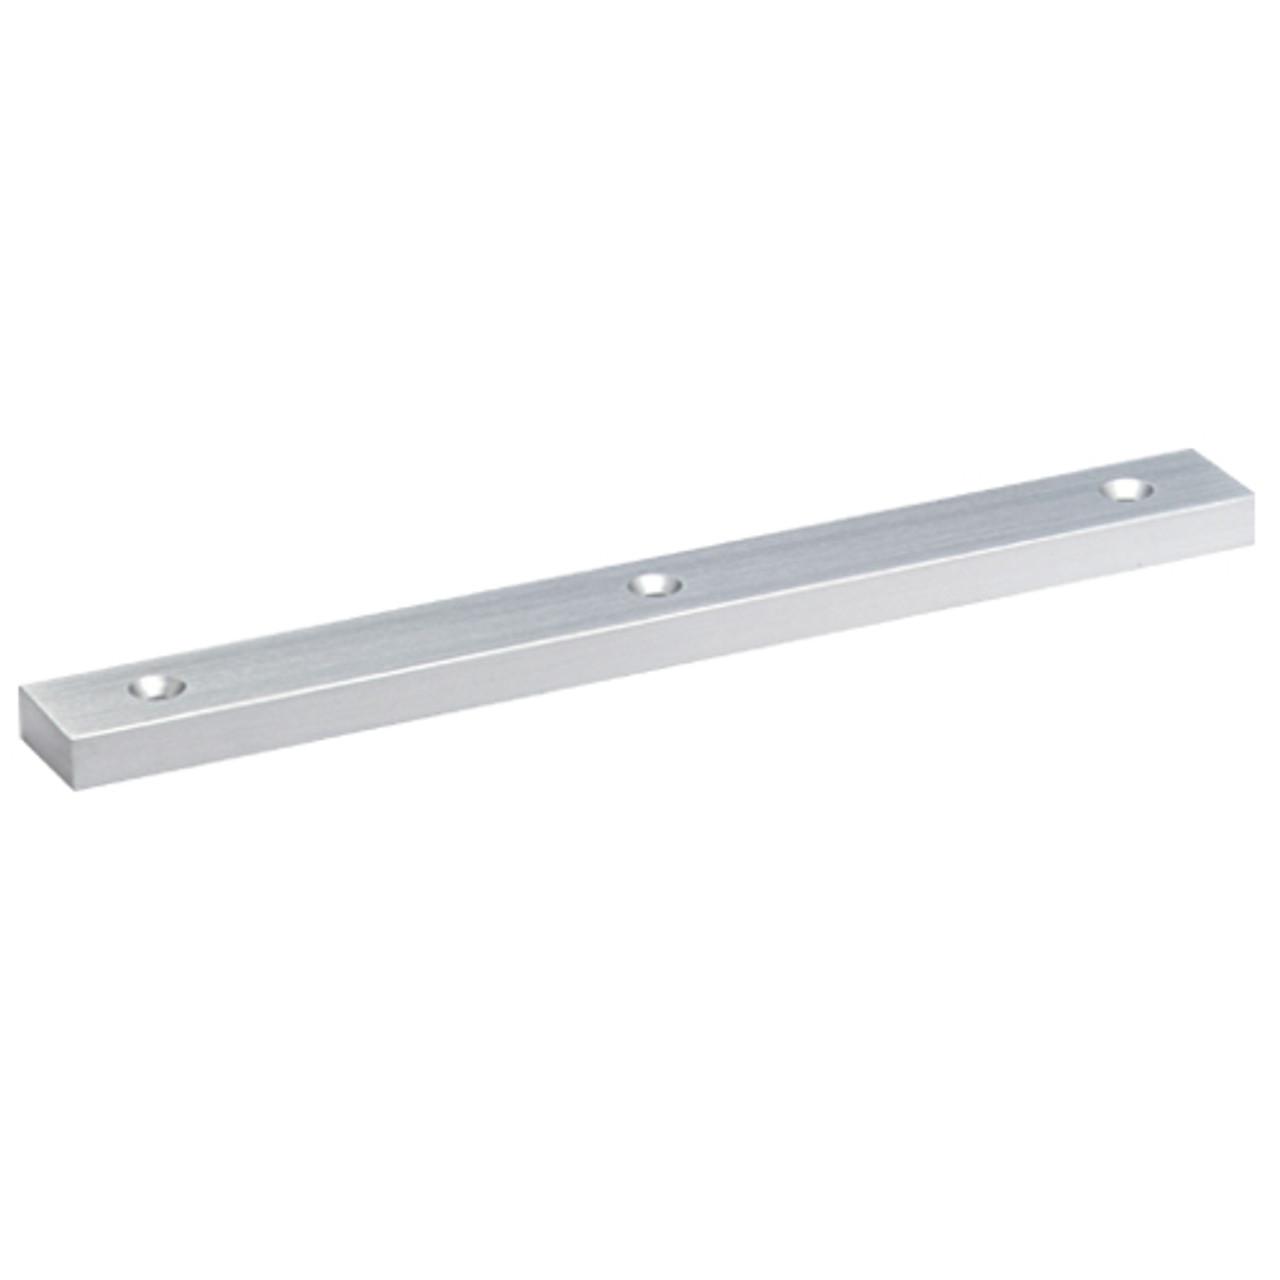 4011-US26 DynaLock 4000 Series Filler Plates for Single Maglocks in Bright Chrome